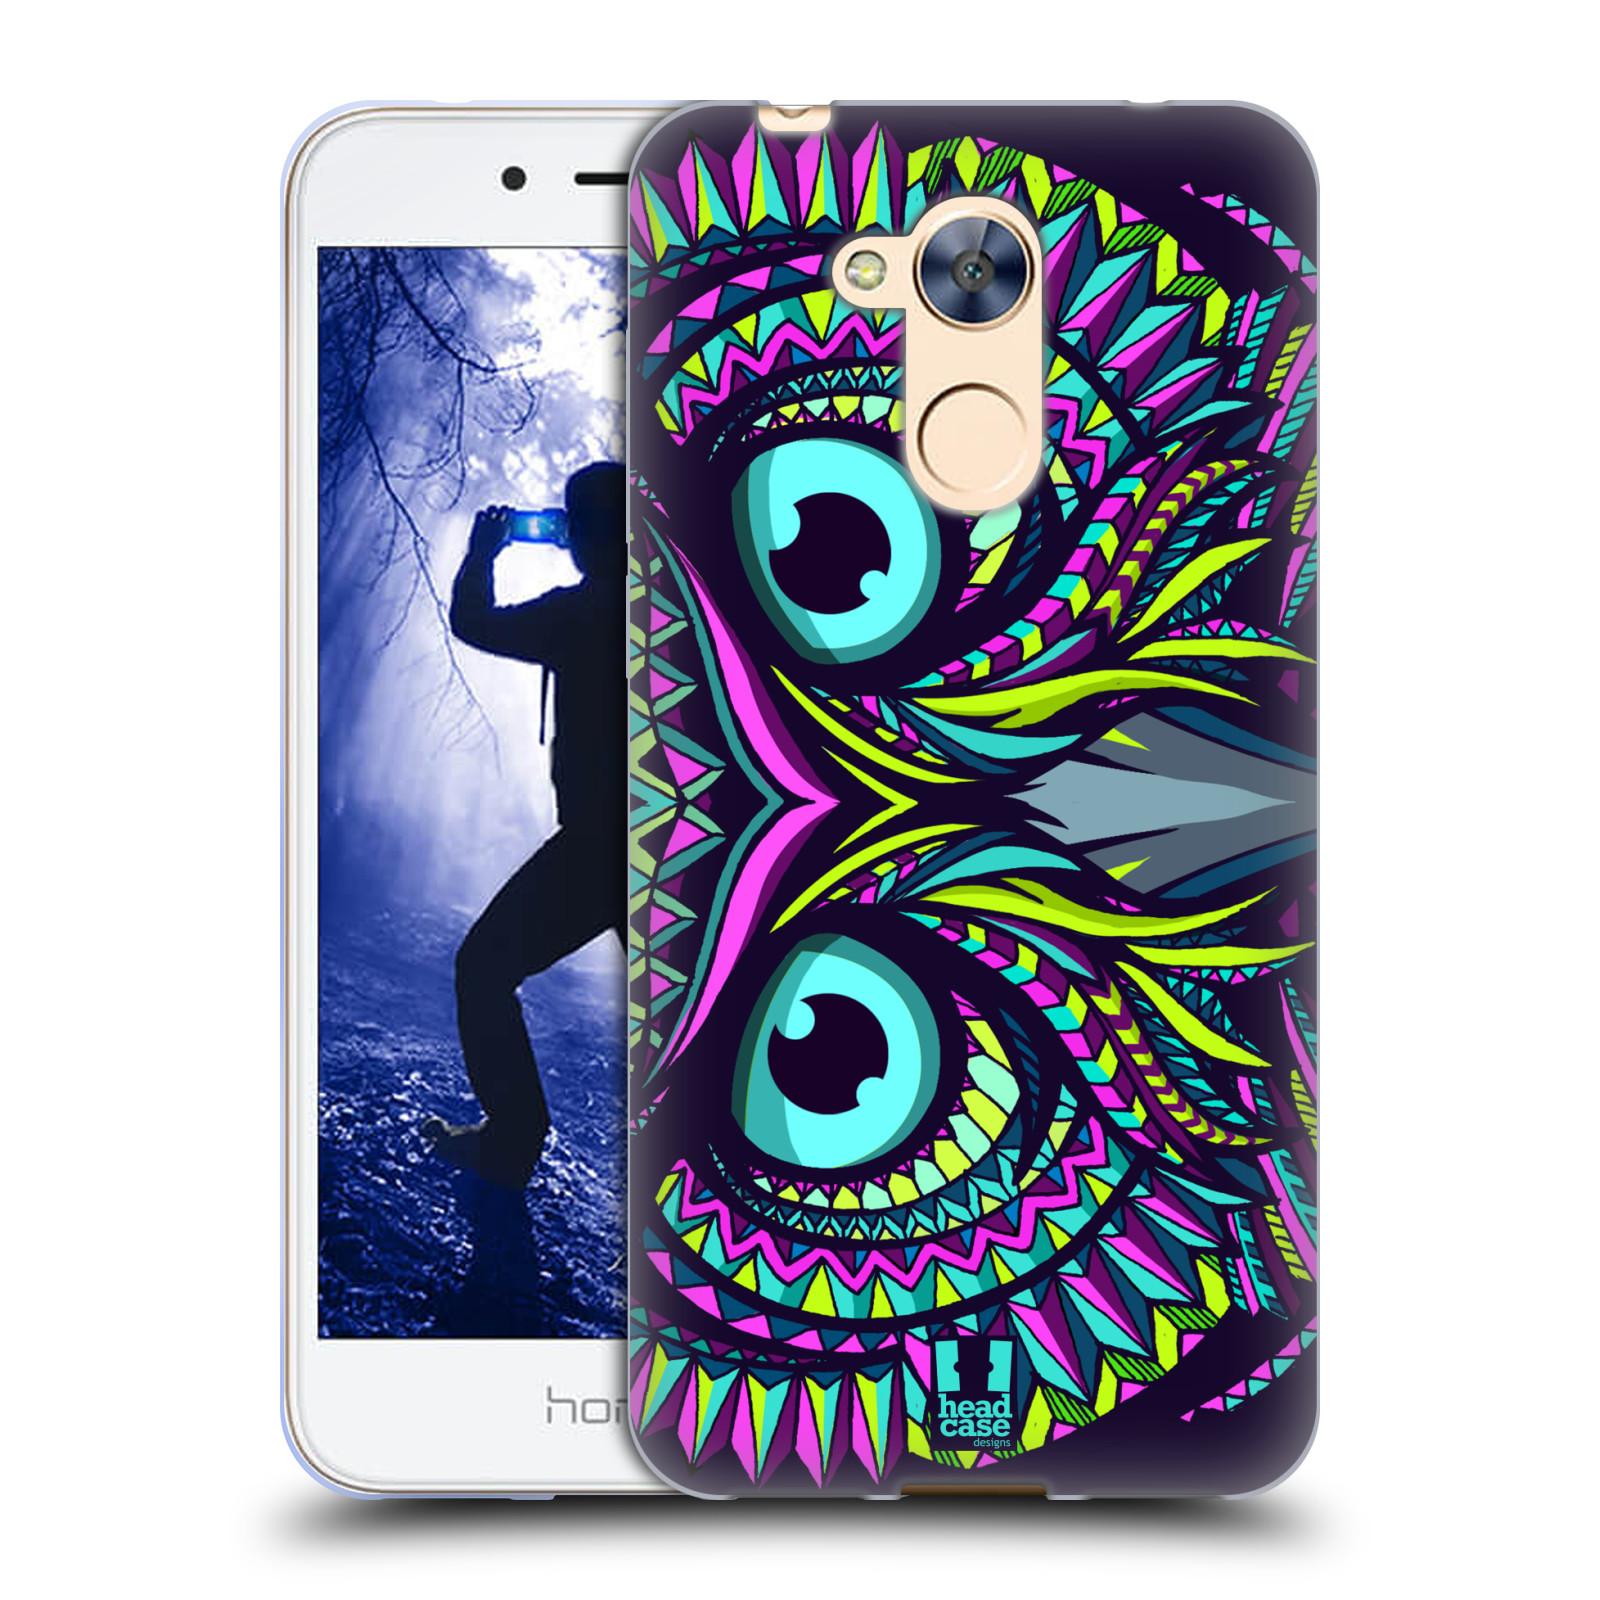 Silikonové pouzdro na mobil Honor 6A - Head Case - AZTEC SOVA